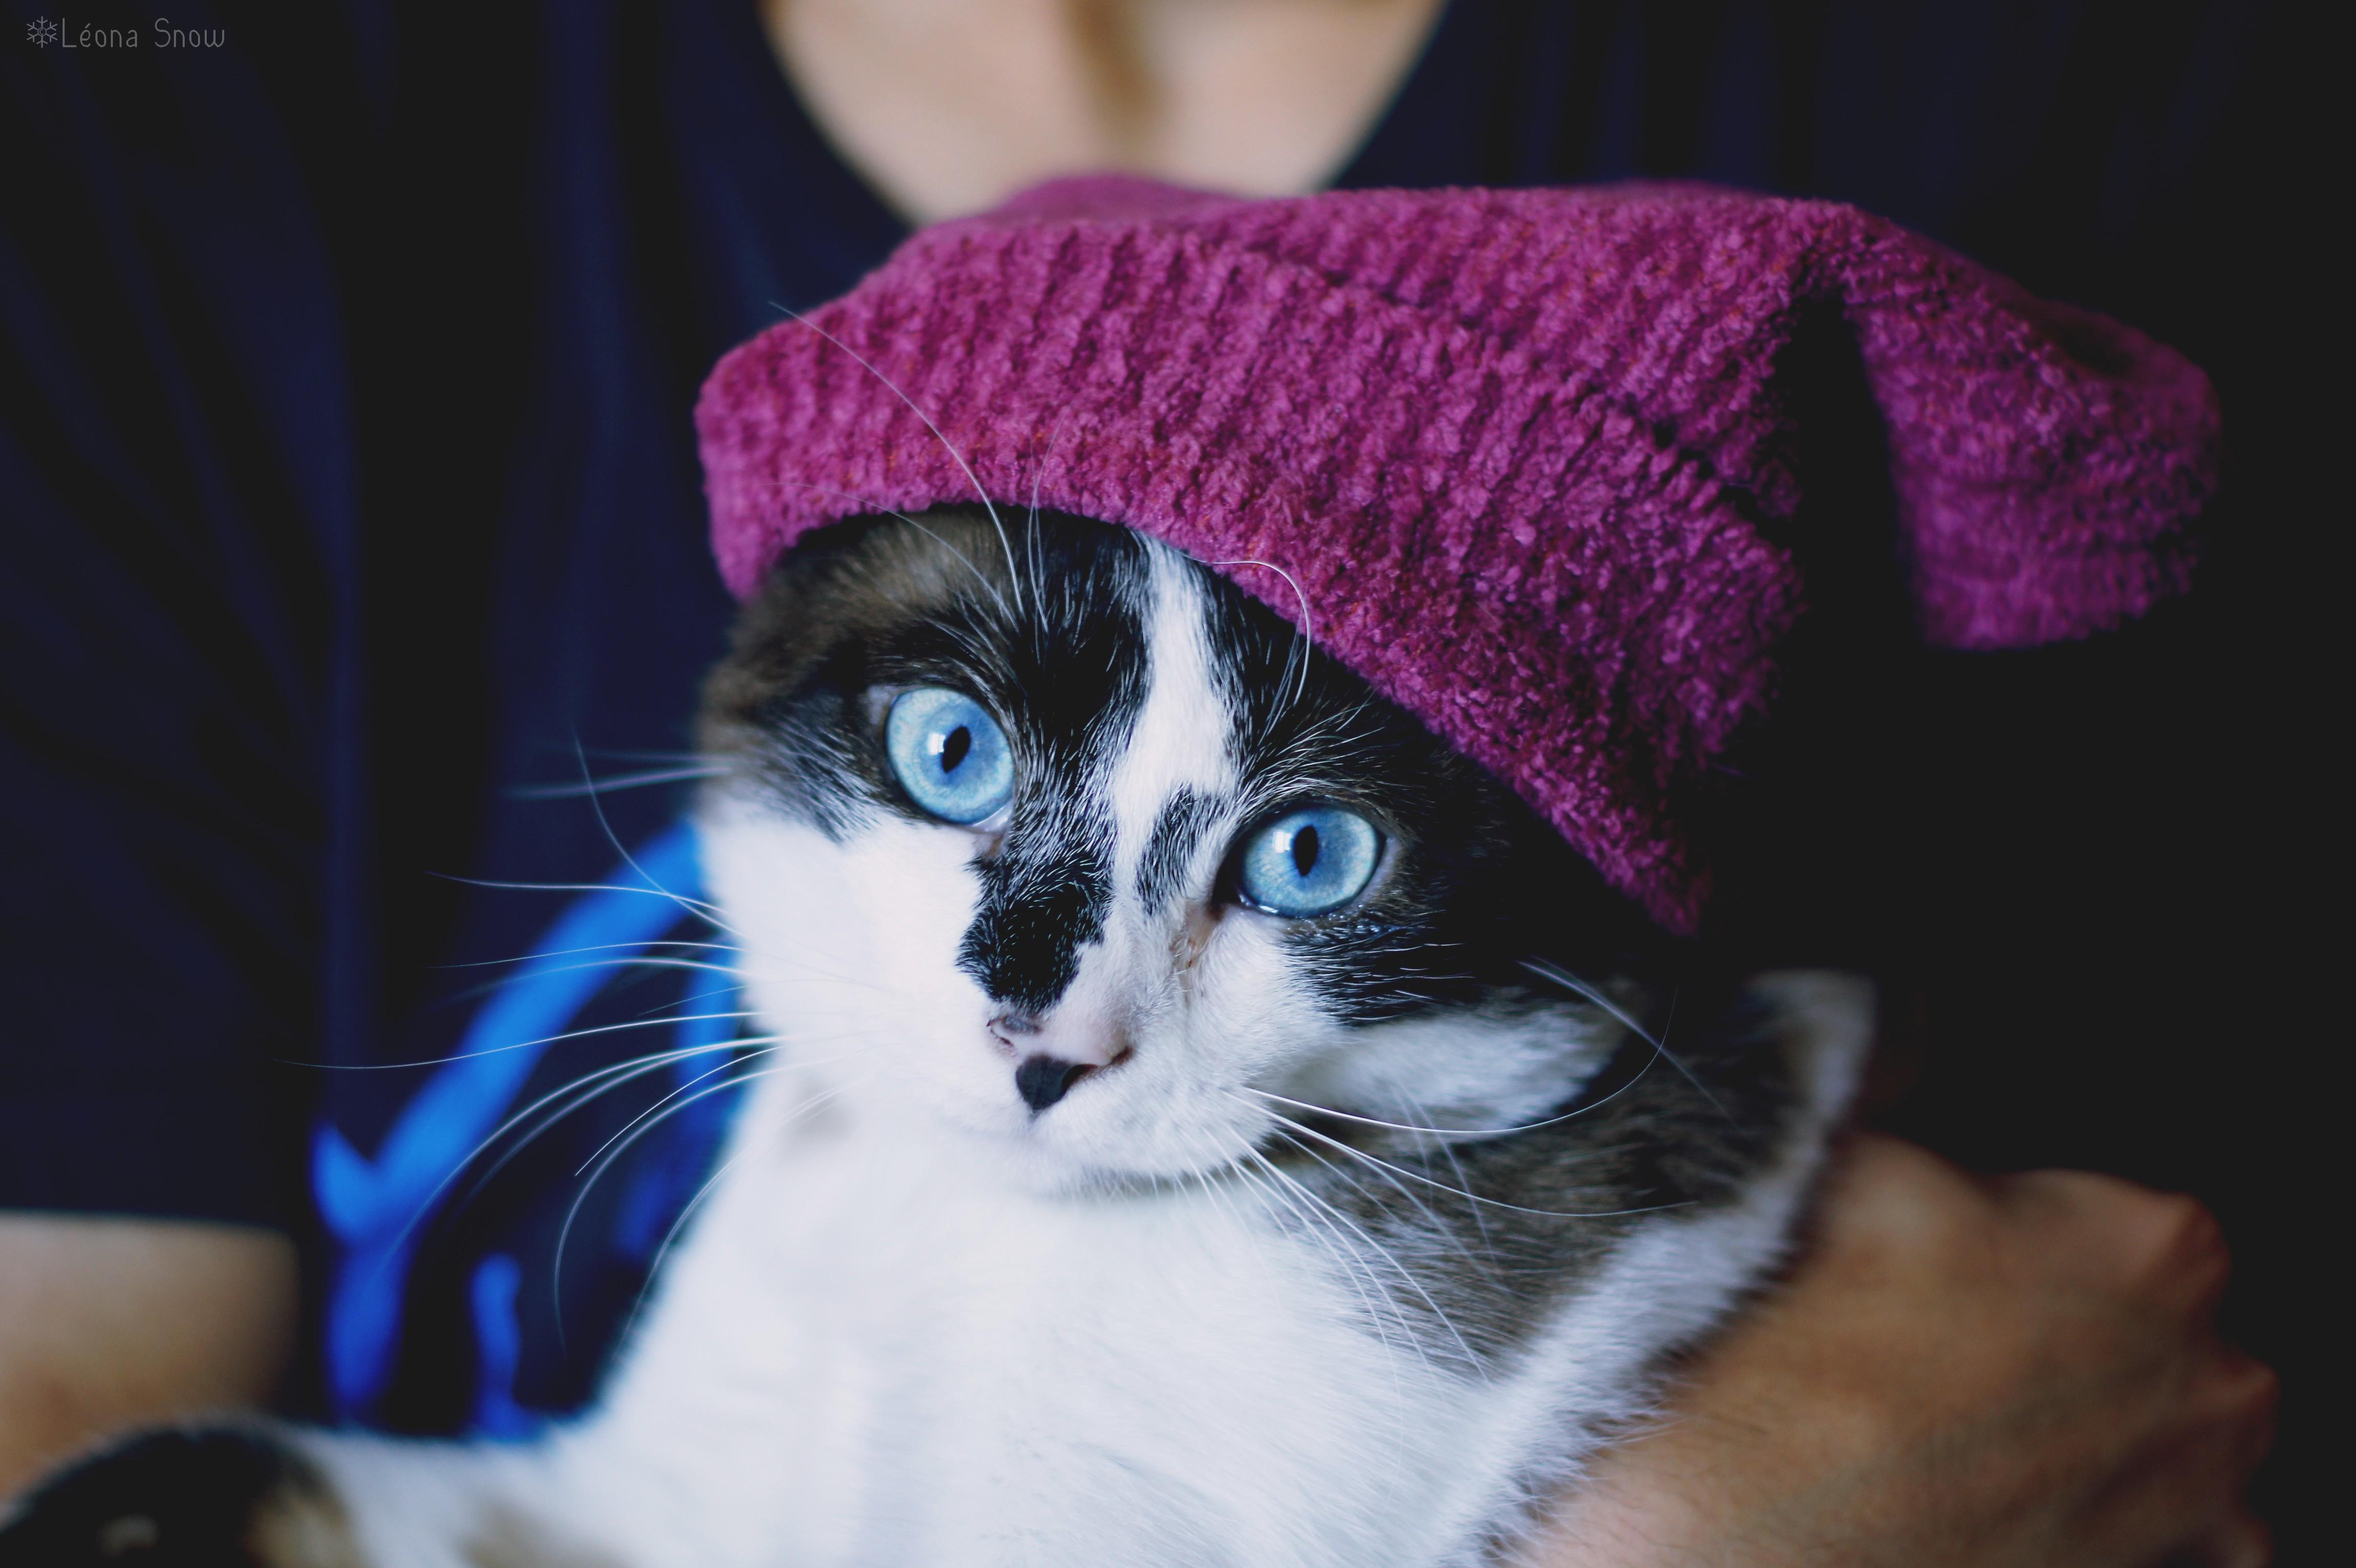 шапки с кошками картинки вашему вниманию идеи